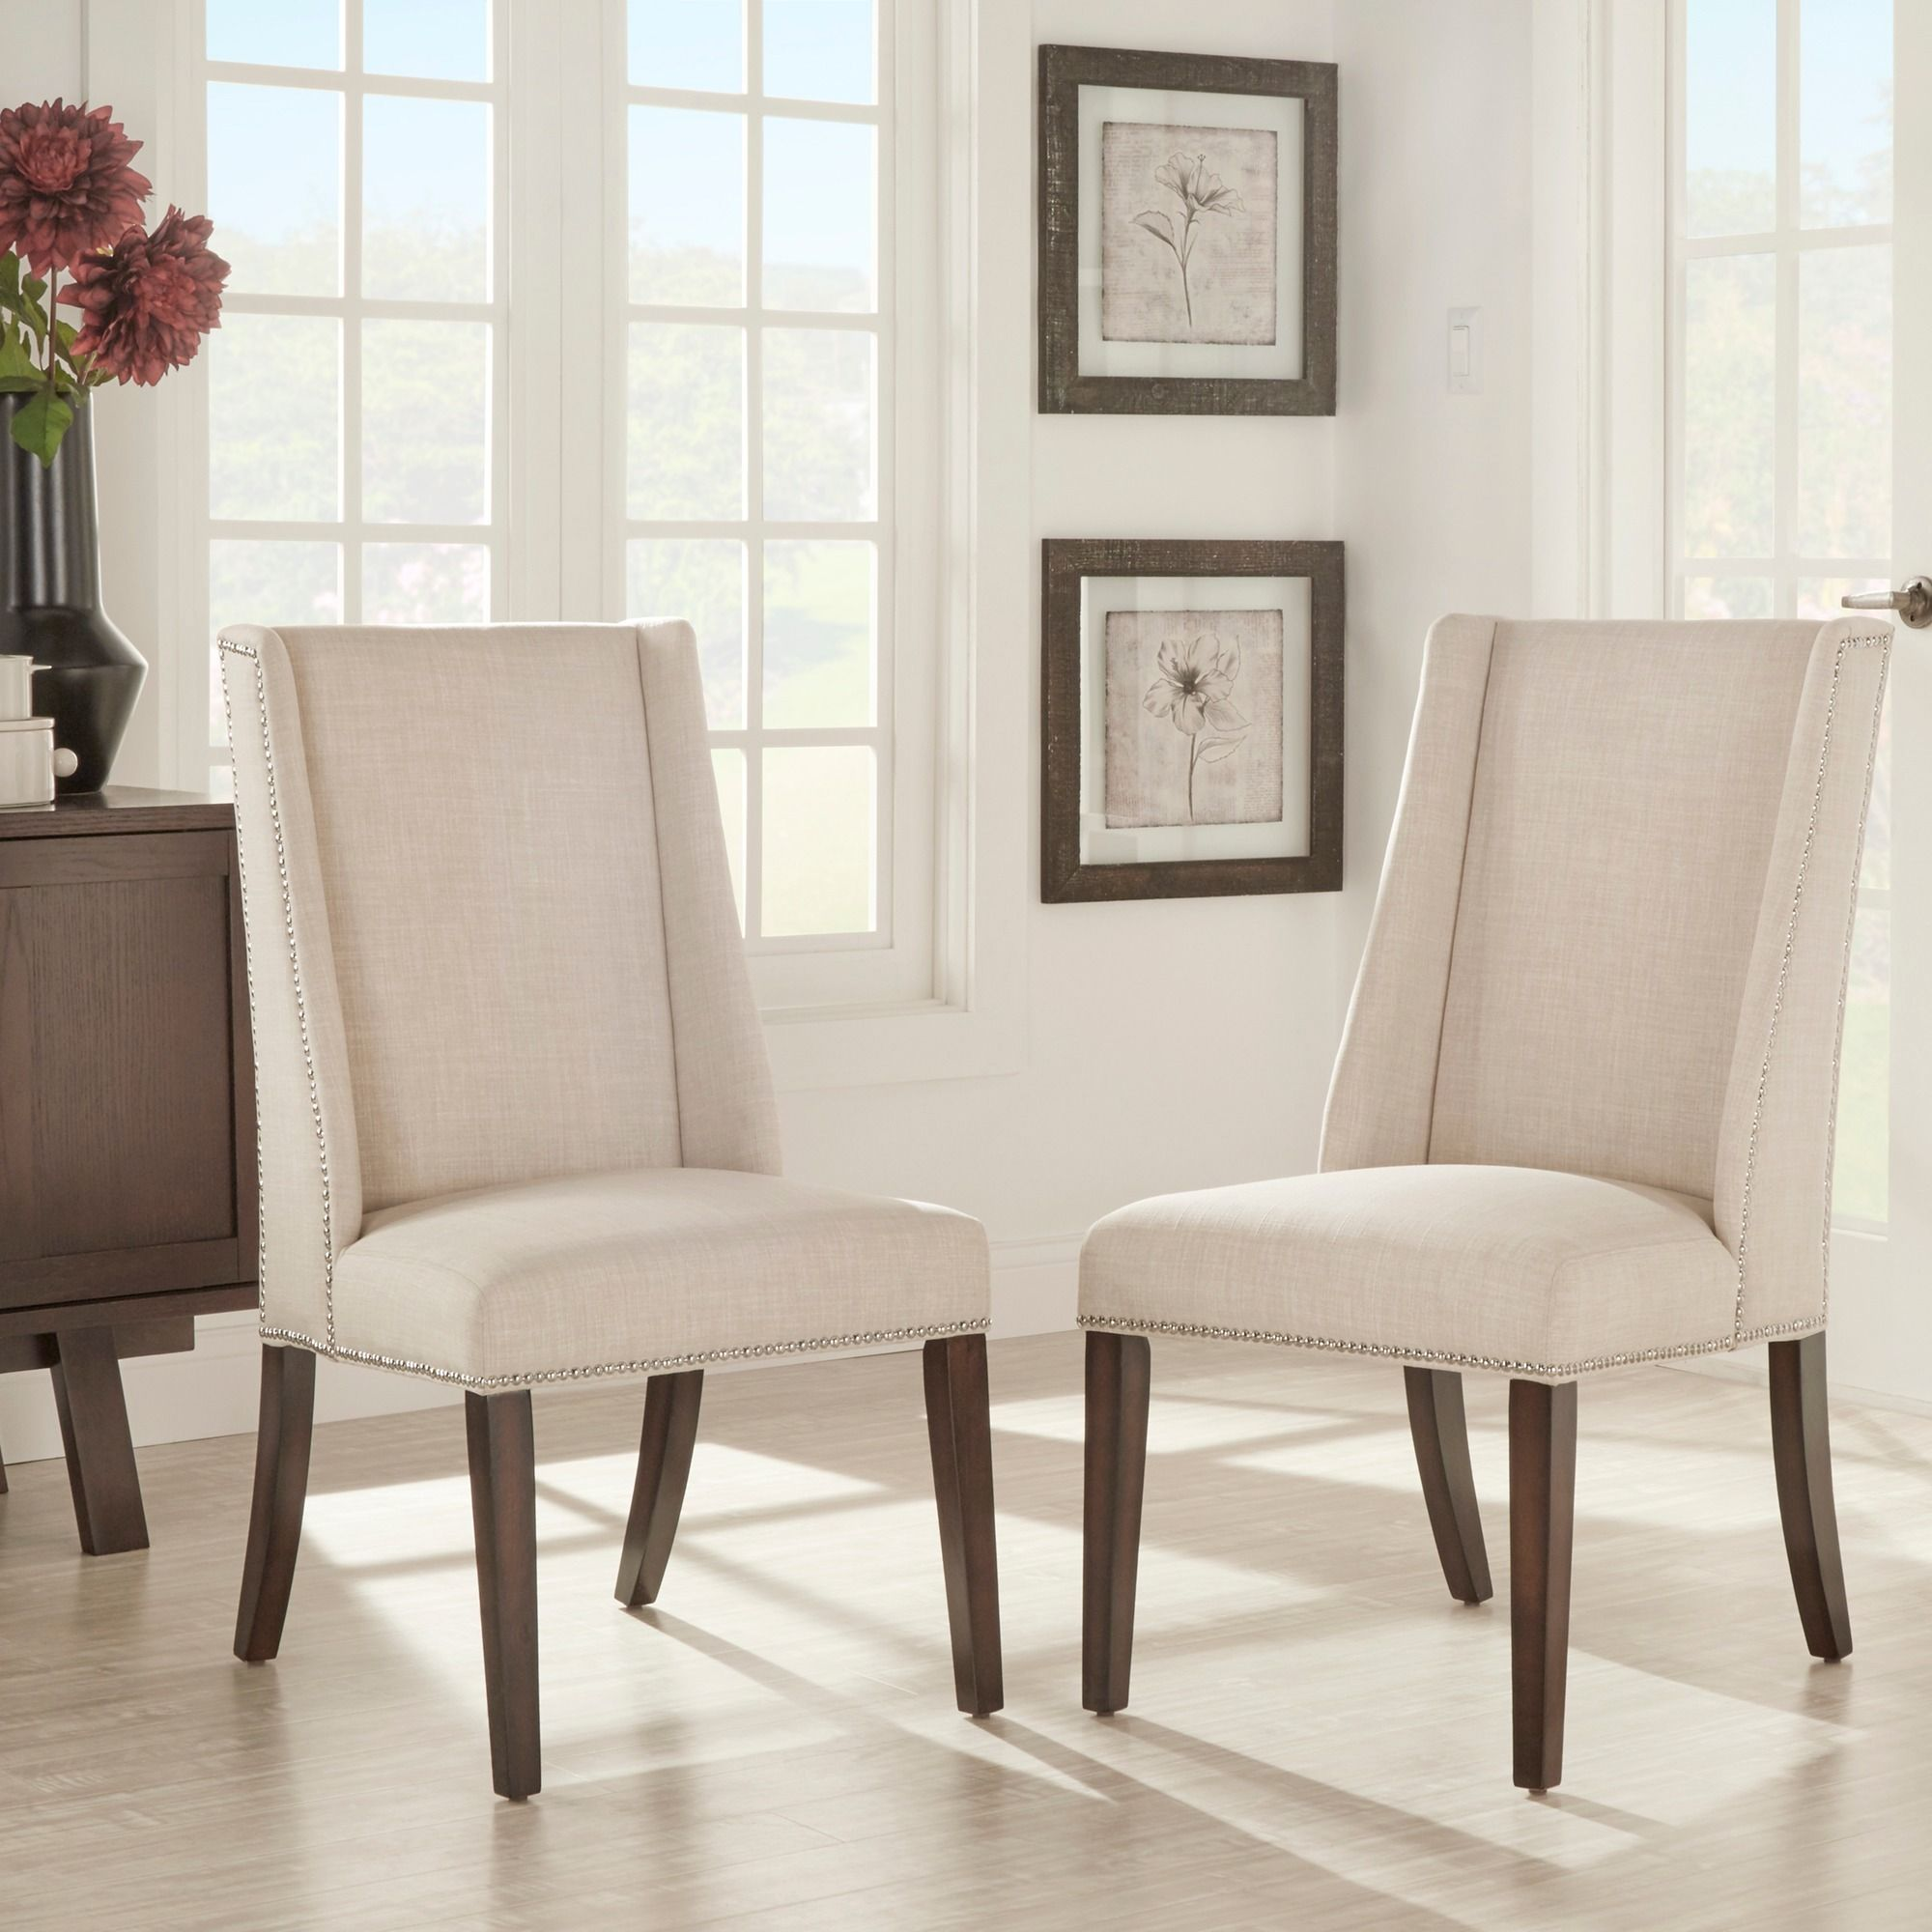 Inspire Q Geneva Linen Wingback Hostess Chairs Set of 2 Tan